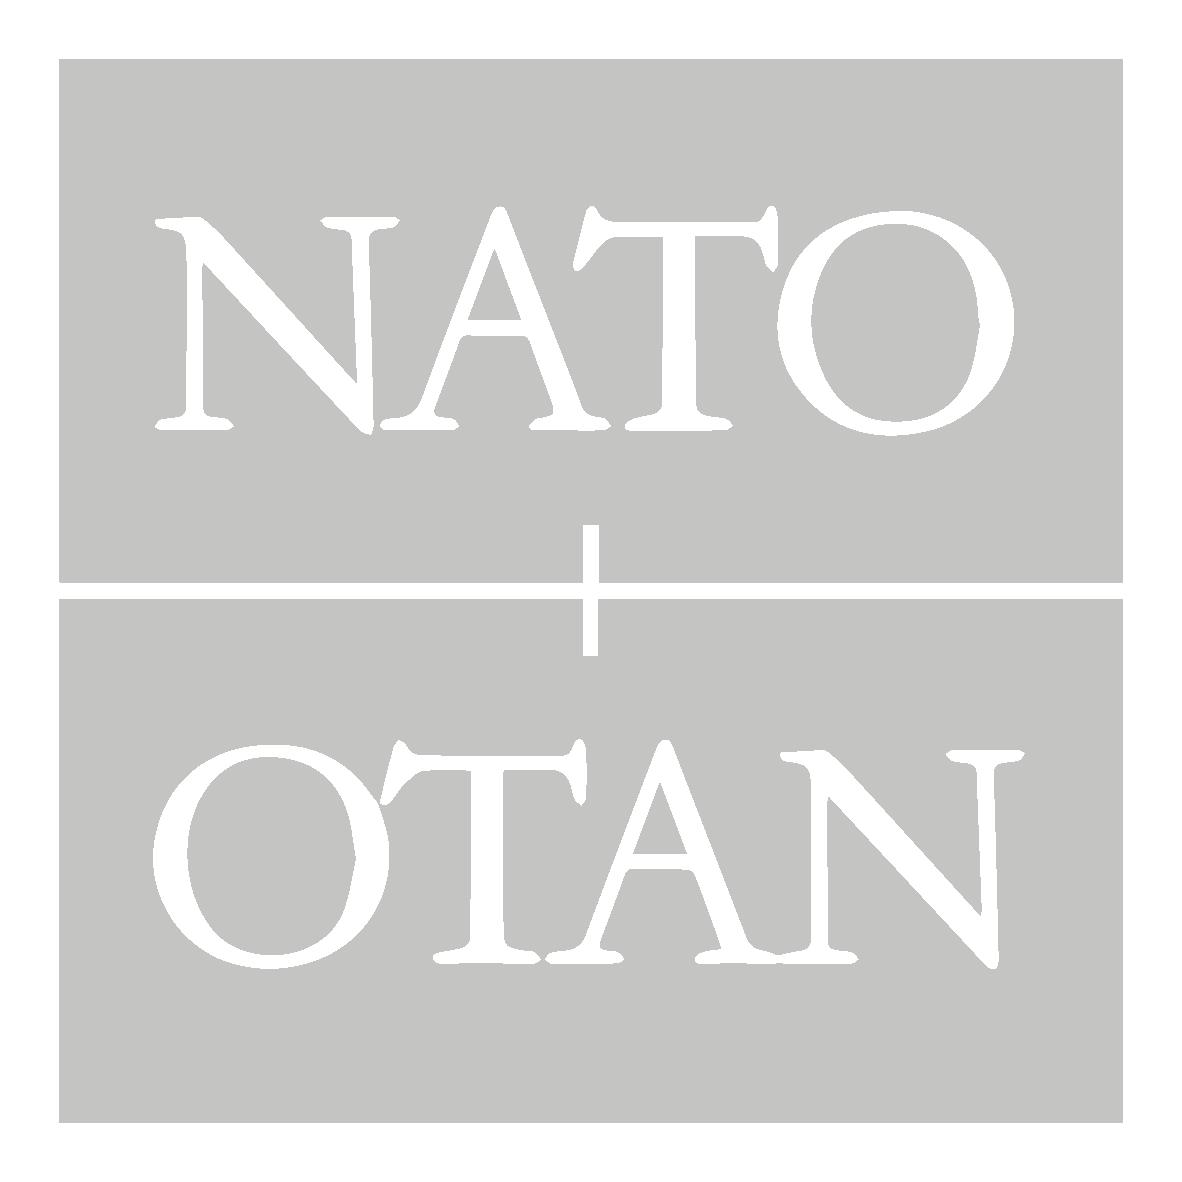 nato_logo_footer-01.png